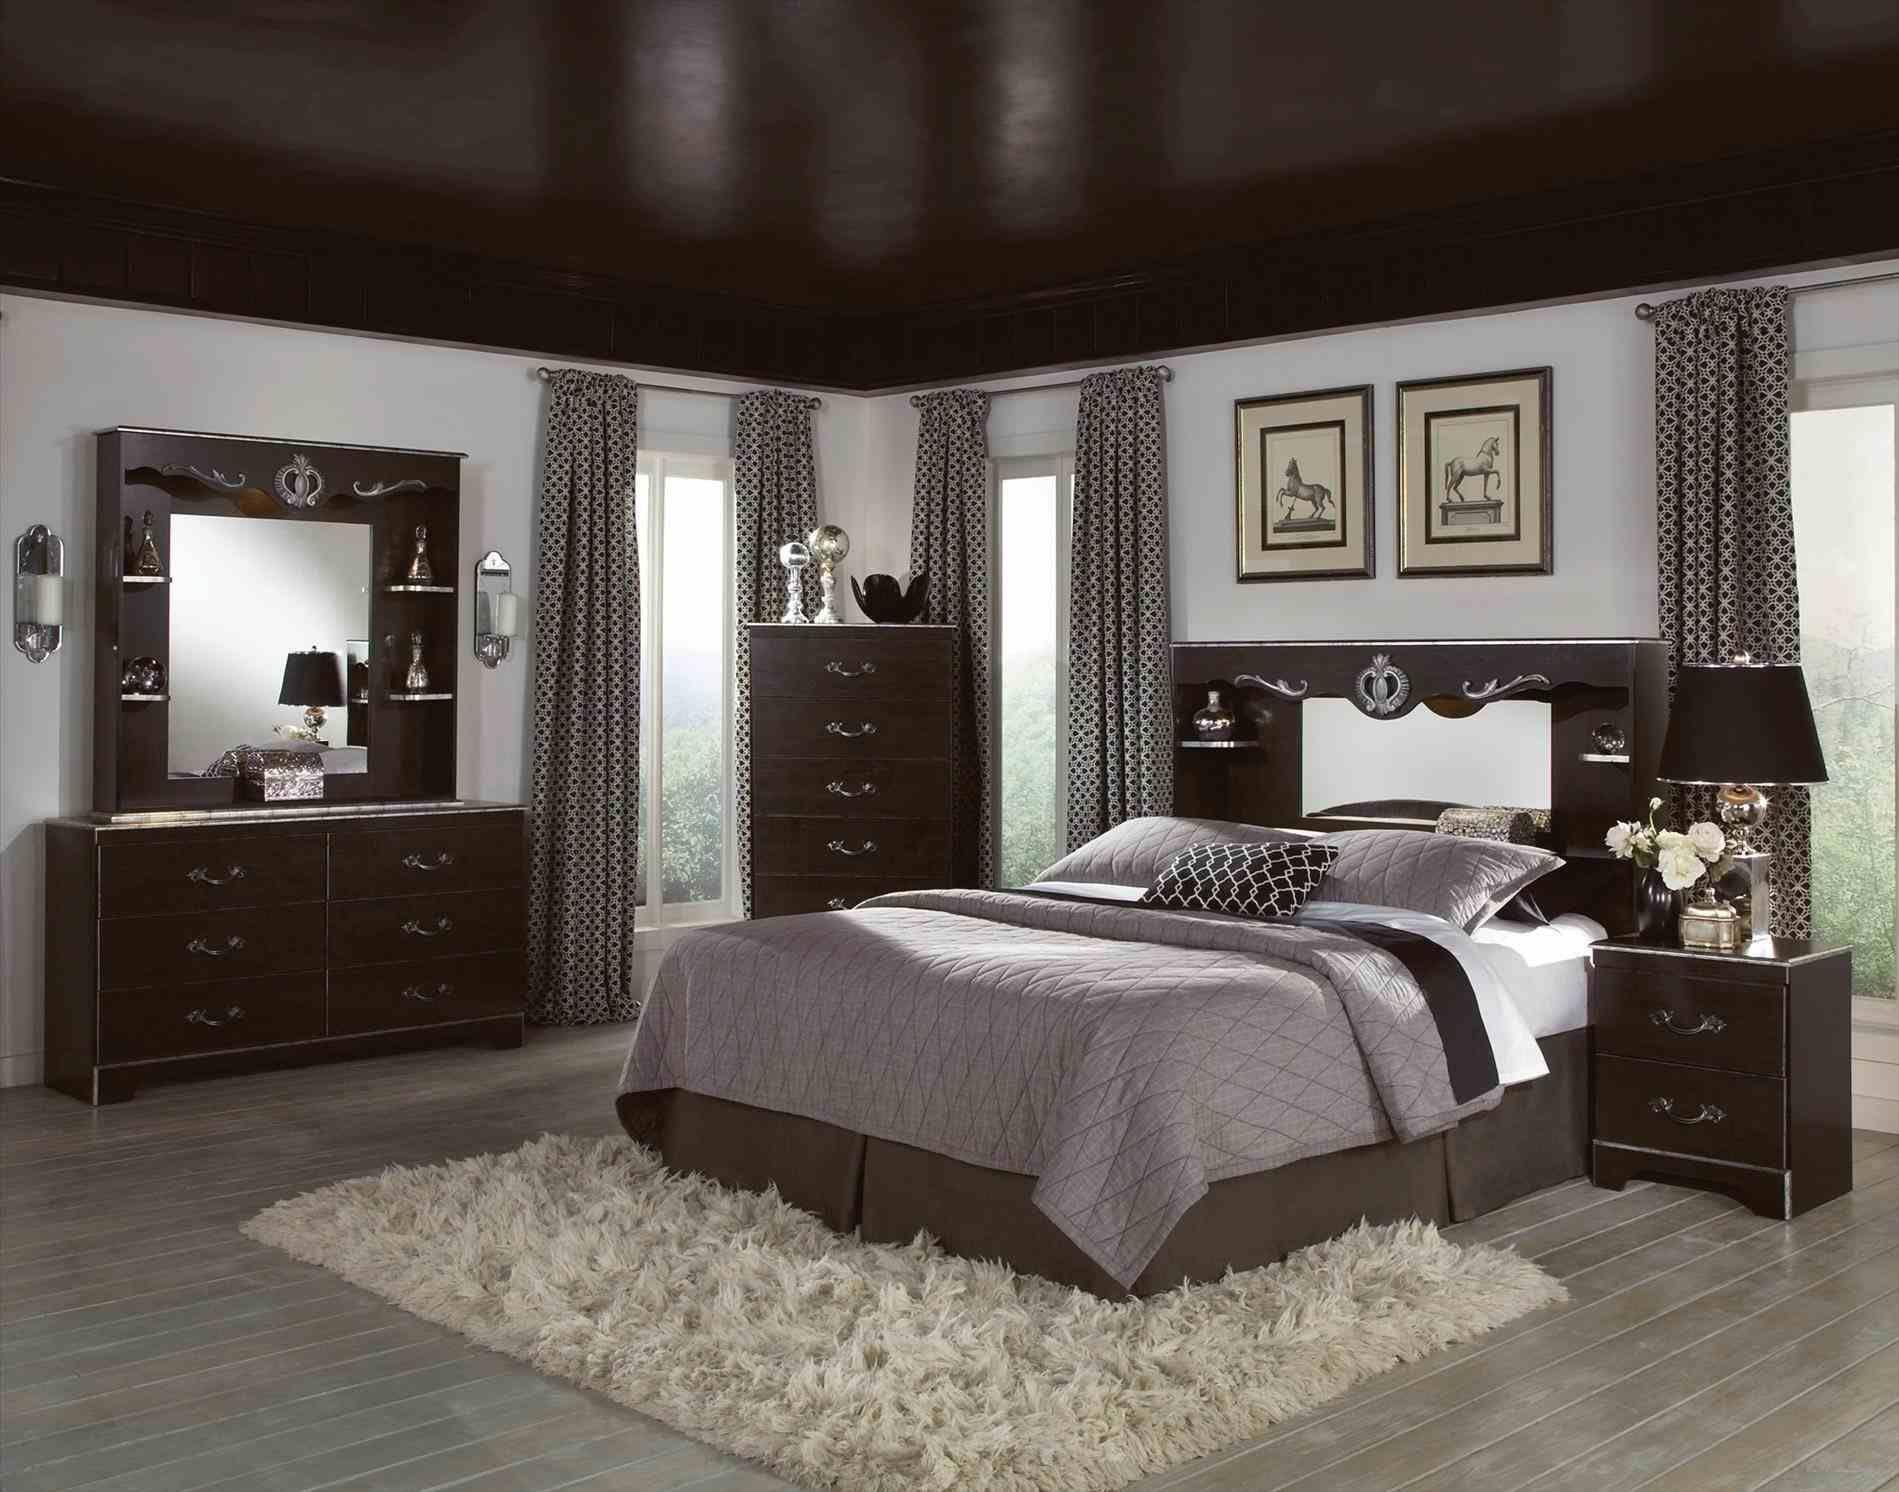 bedroom decorating ideas with black furniture bedroom decor rh pinterest com